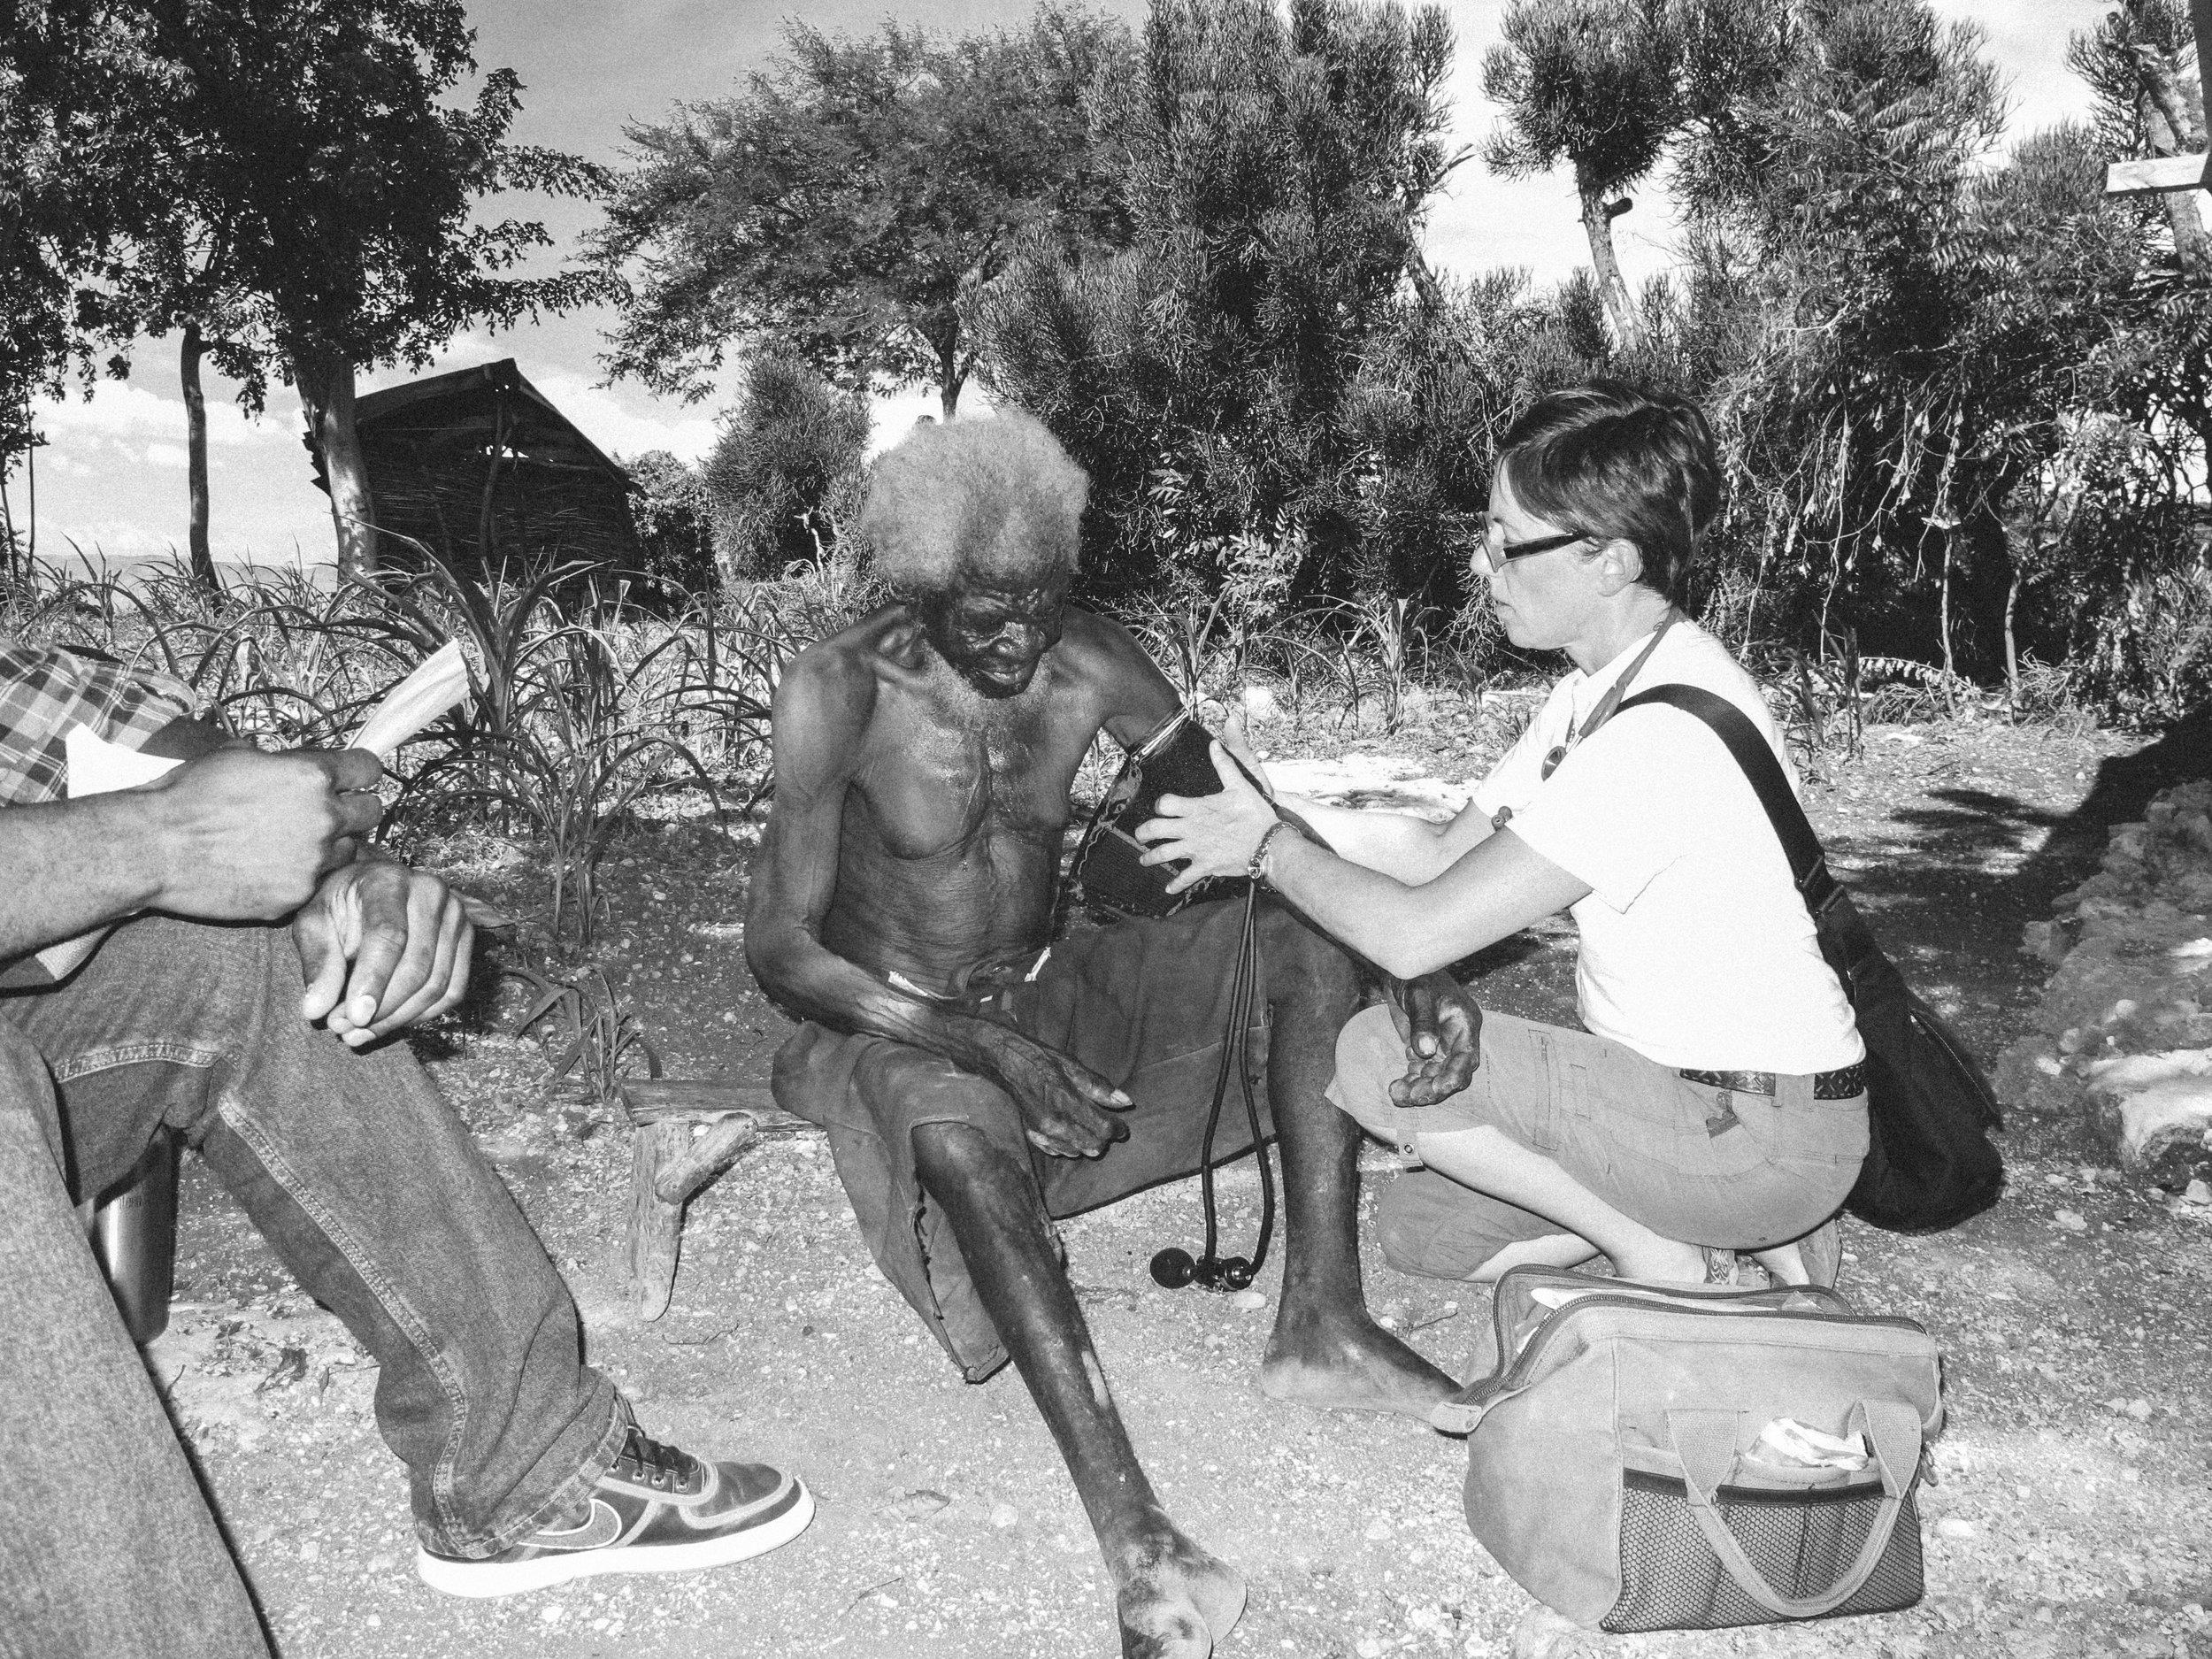 Haiti_Medical_missions_healthcare_healing_art_missions_01.JPG